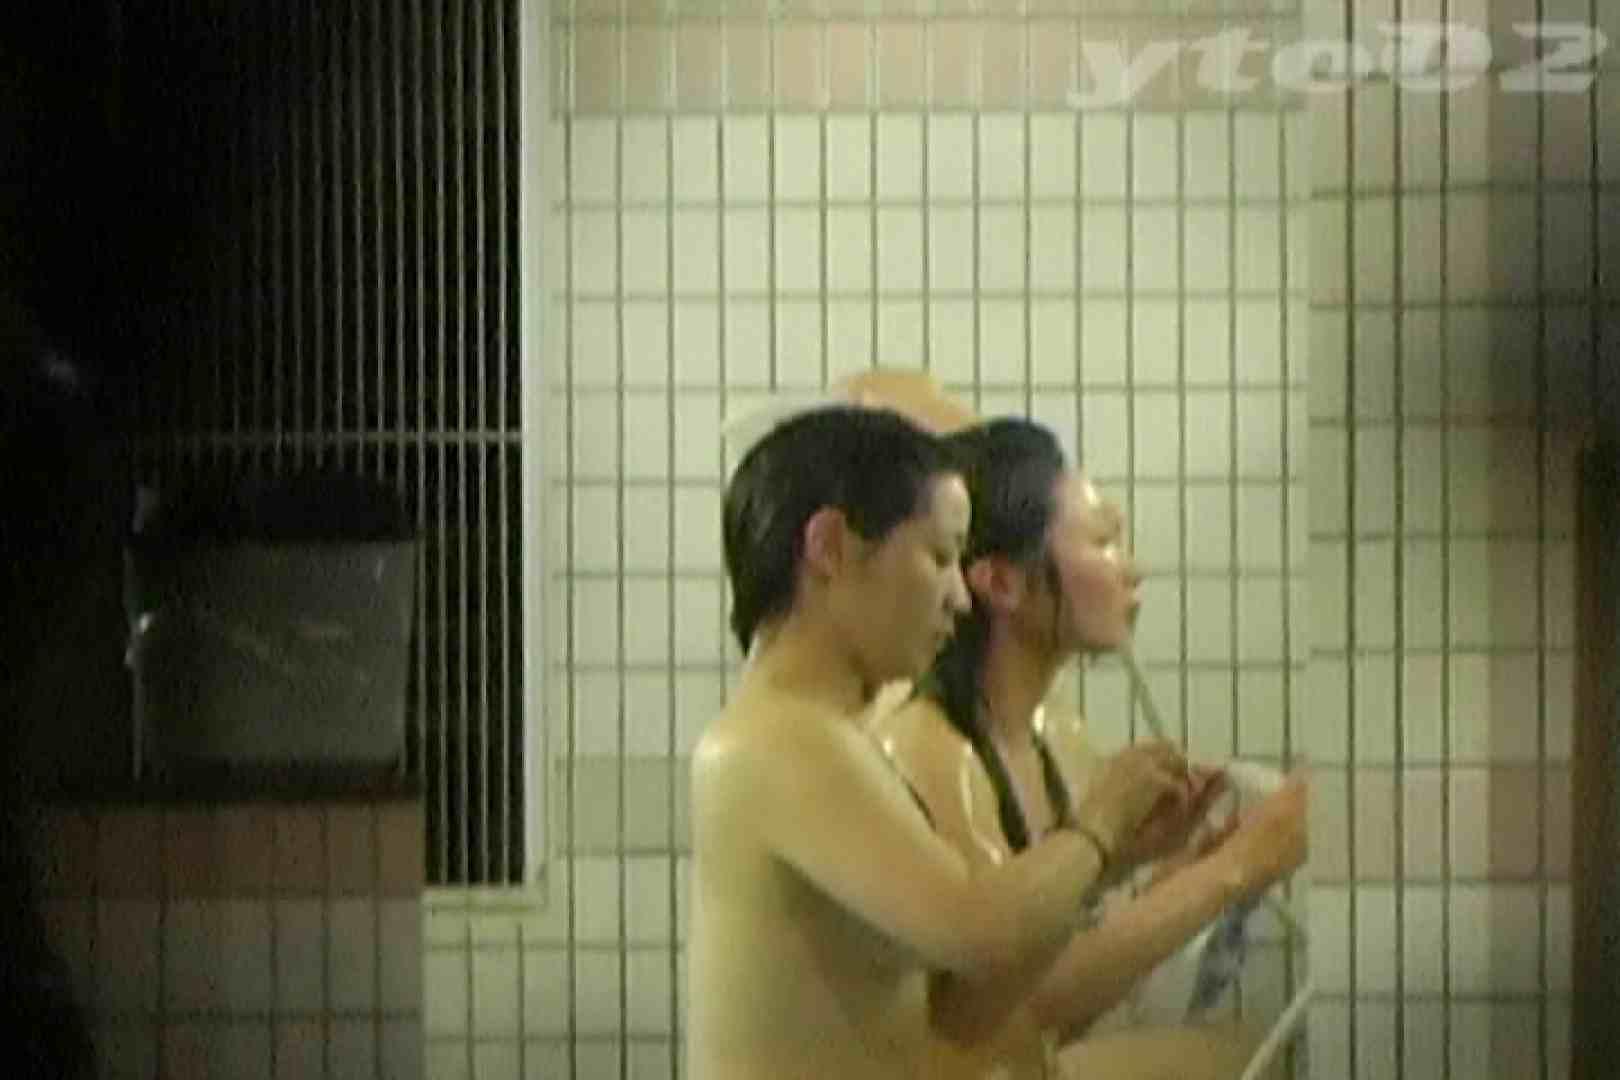 ▲復活限定▲合宿ホテル女風呂盗撮 Vol.12 盗撮で悶絶   名作  59画像 9